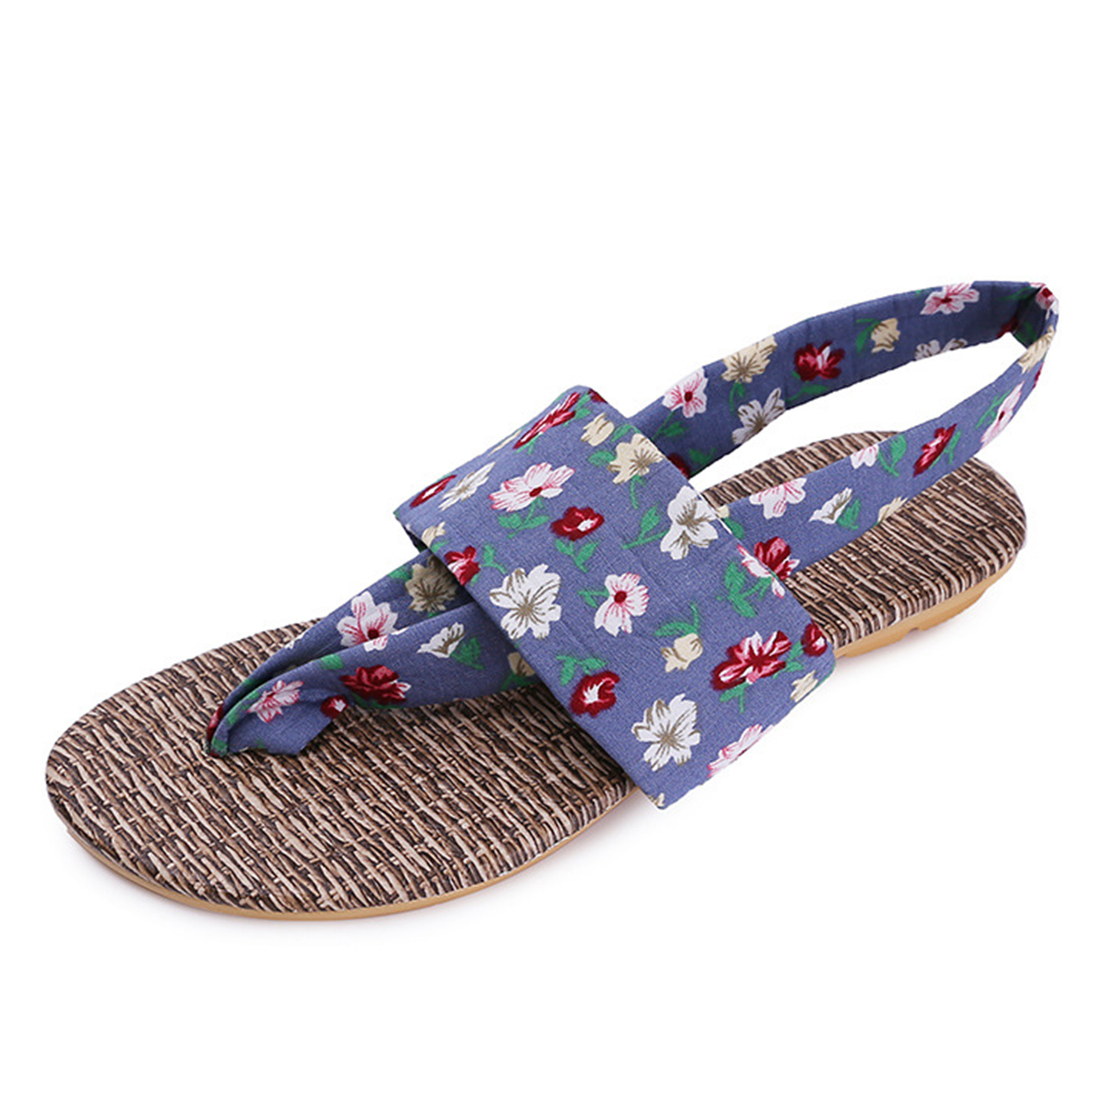 Casual Beach Slipper Sandals Brand New design Summer Flower printing Flip Flop big Size Shoes women new 2017 sandals 2016 new famous brand buckle womens flip flop sandals summer beach sandals af327